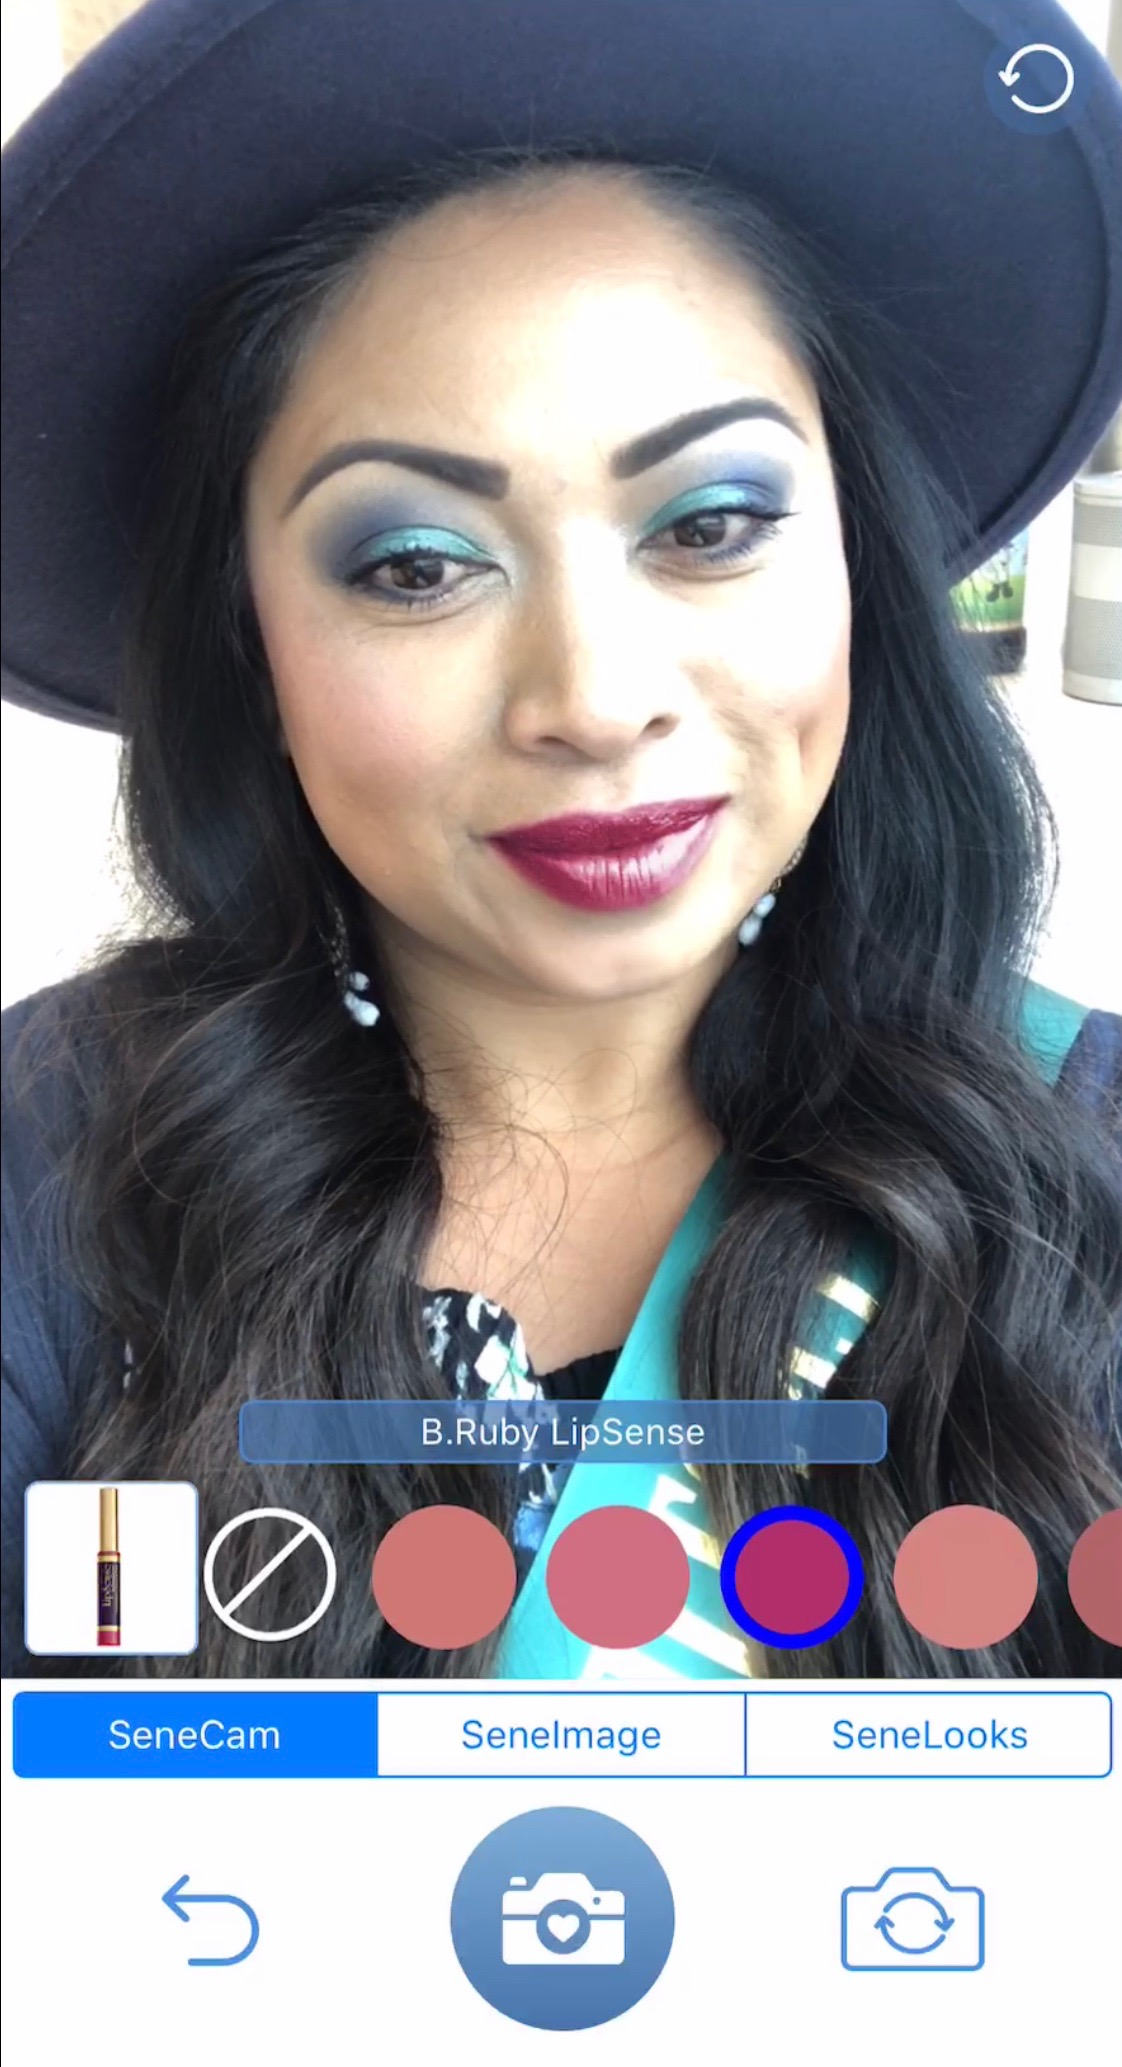 SeneGence New SeneLook App - Try on Lipsense, ShadowSense, Translucid Powders, Blushsense, and Sense Cosmetics Virtually.